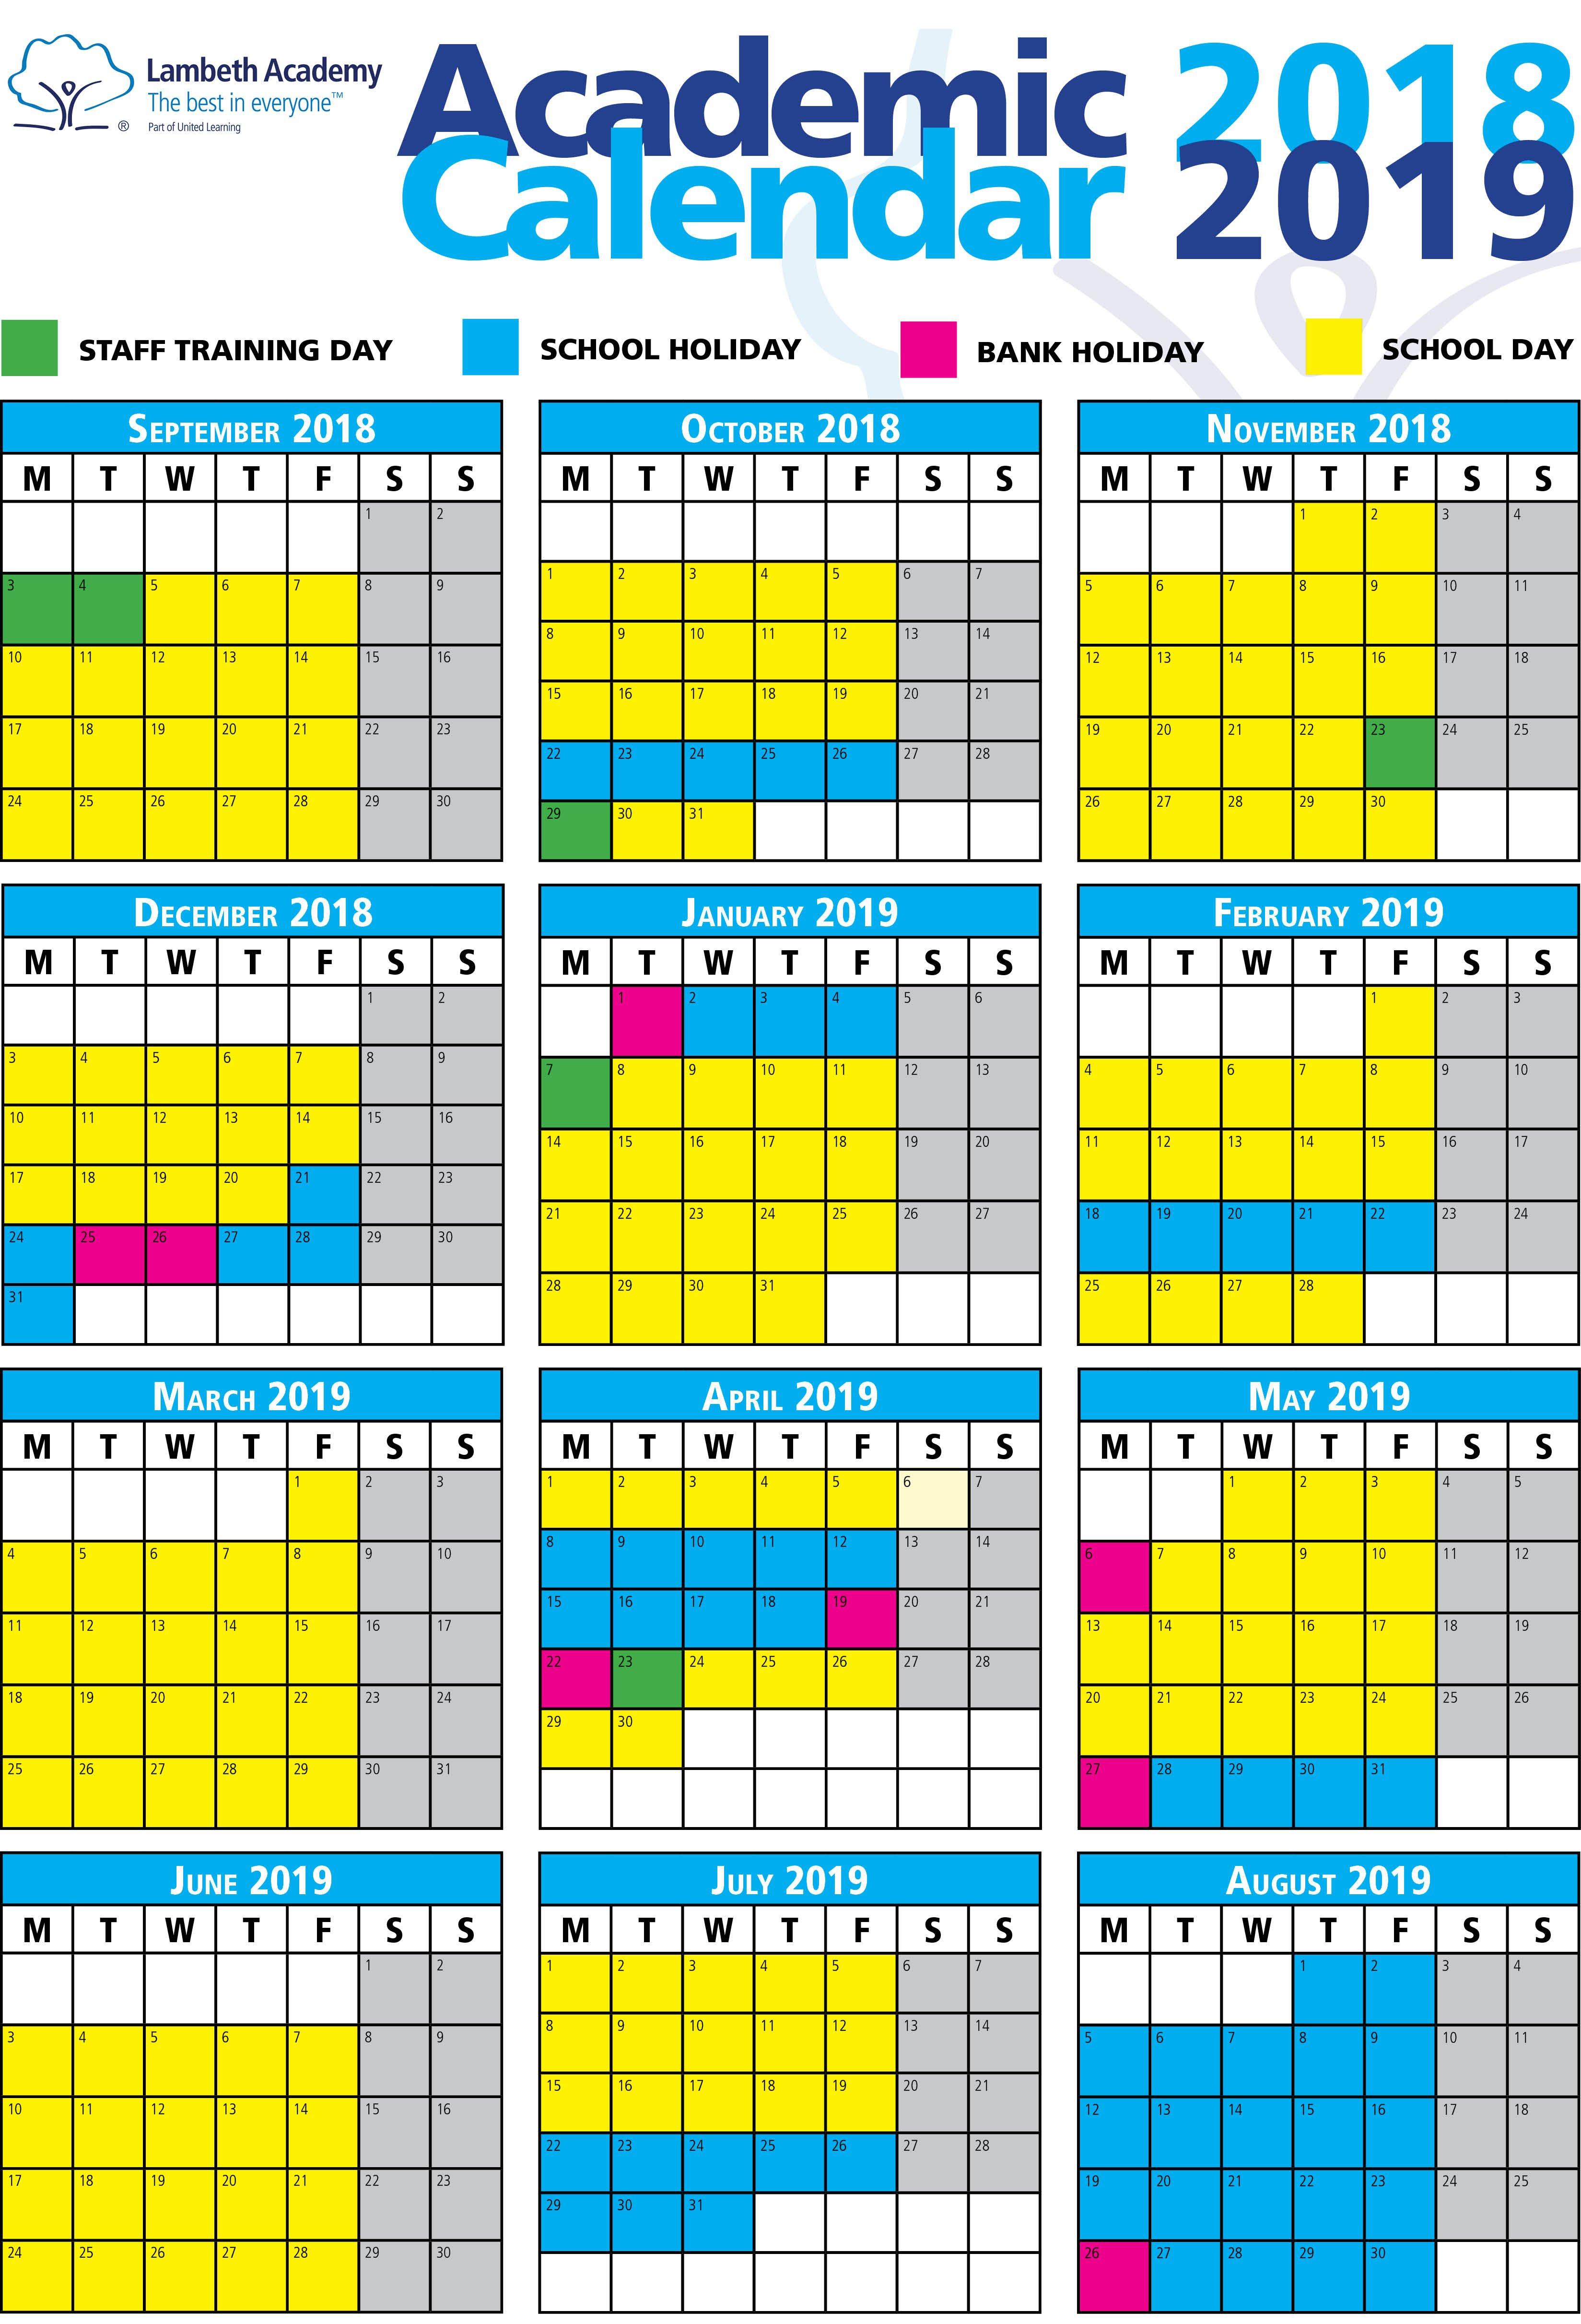 2019 17 School Calendar – Icard.cmi C U Of R Calendar 2019